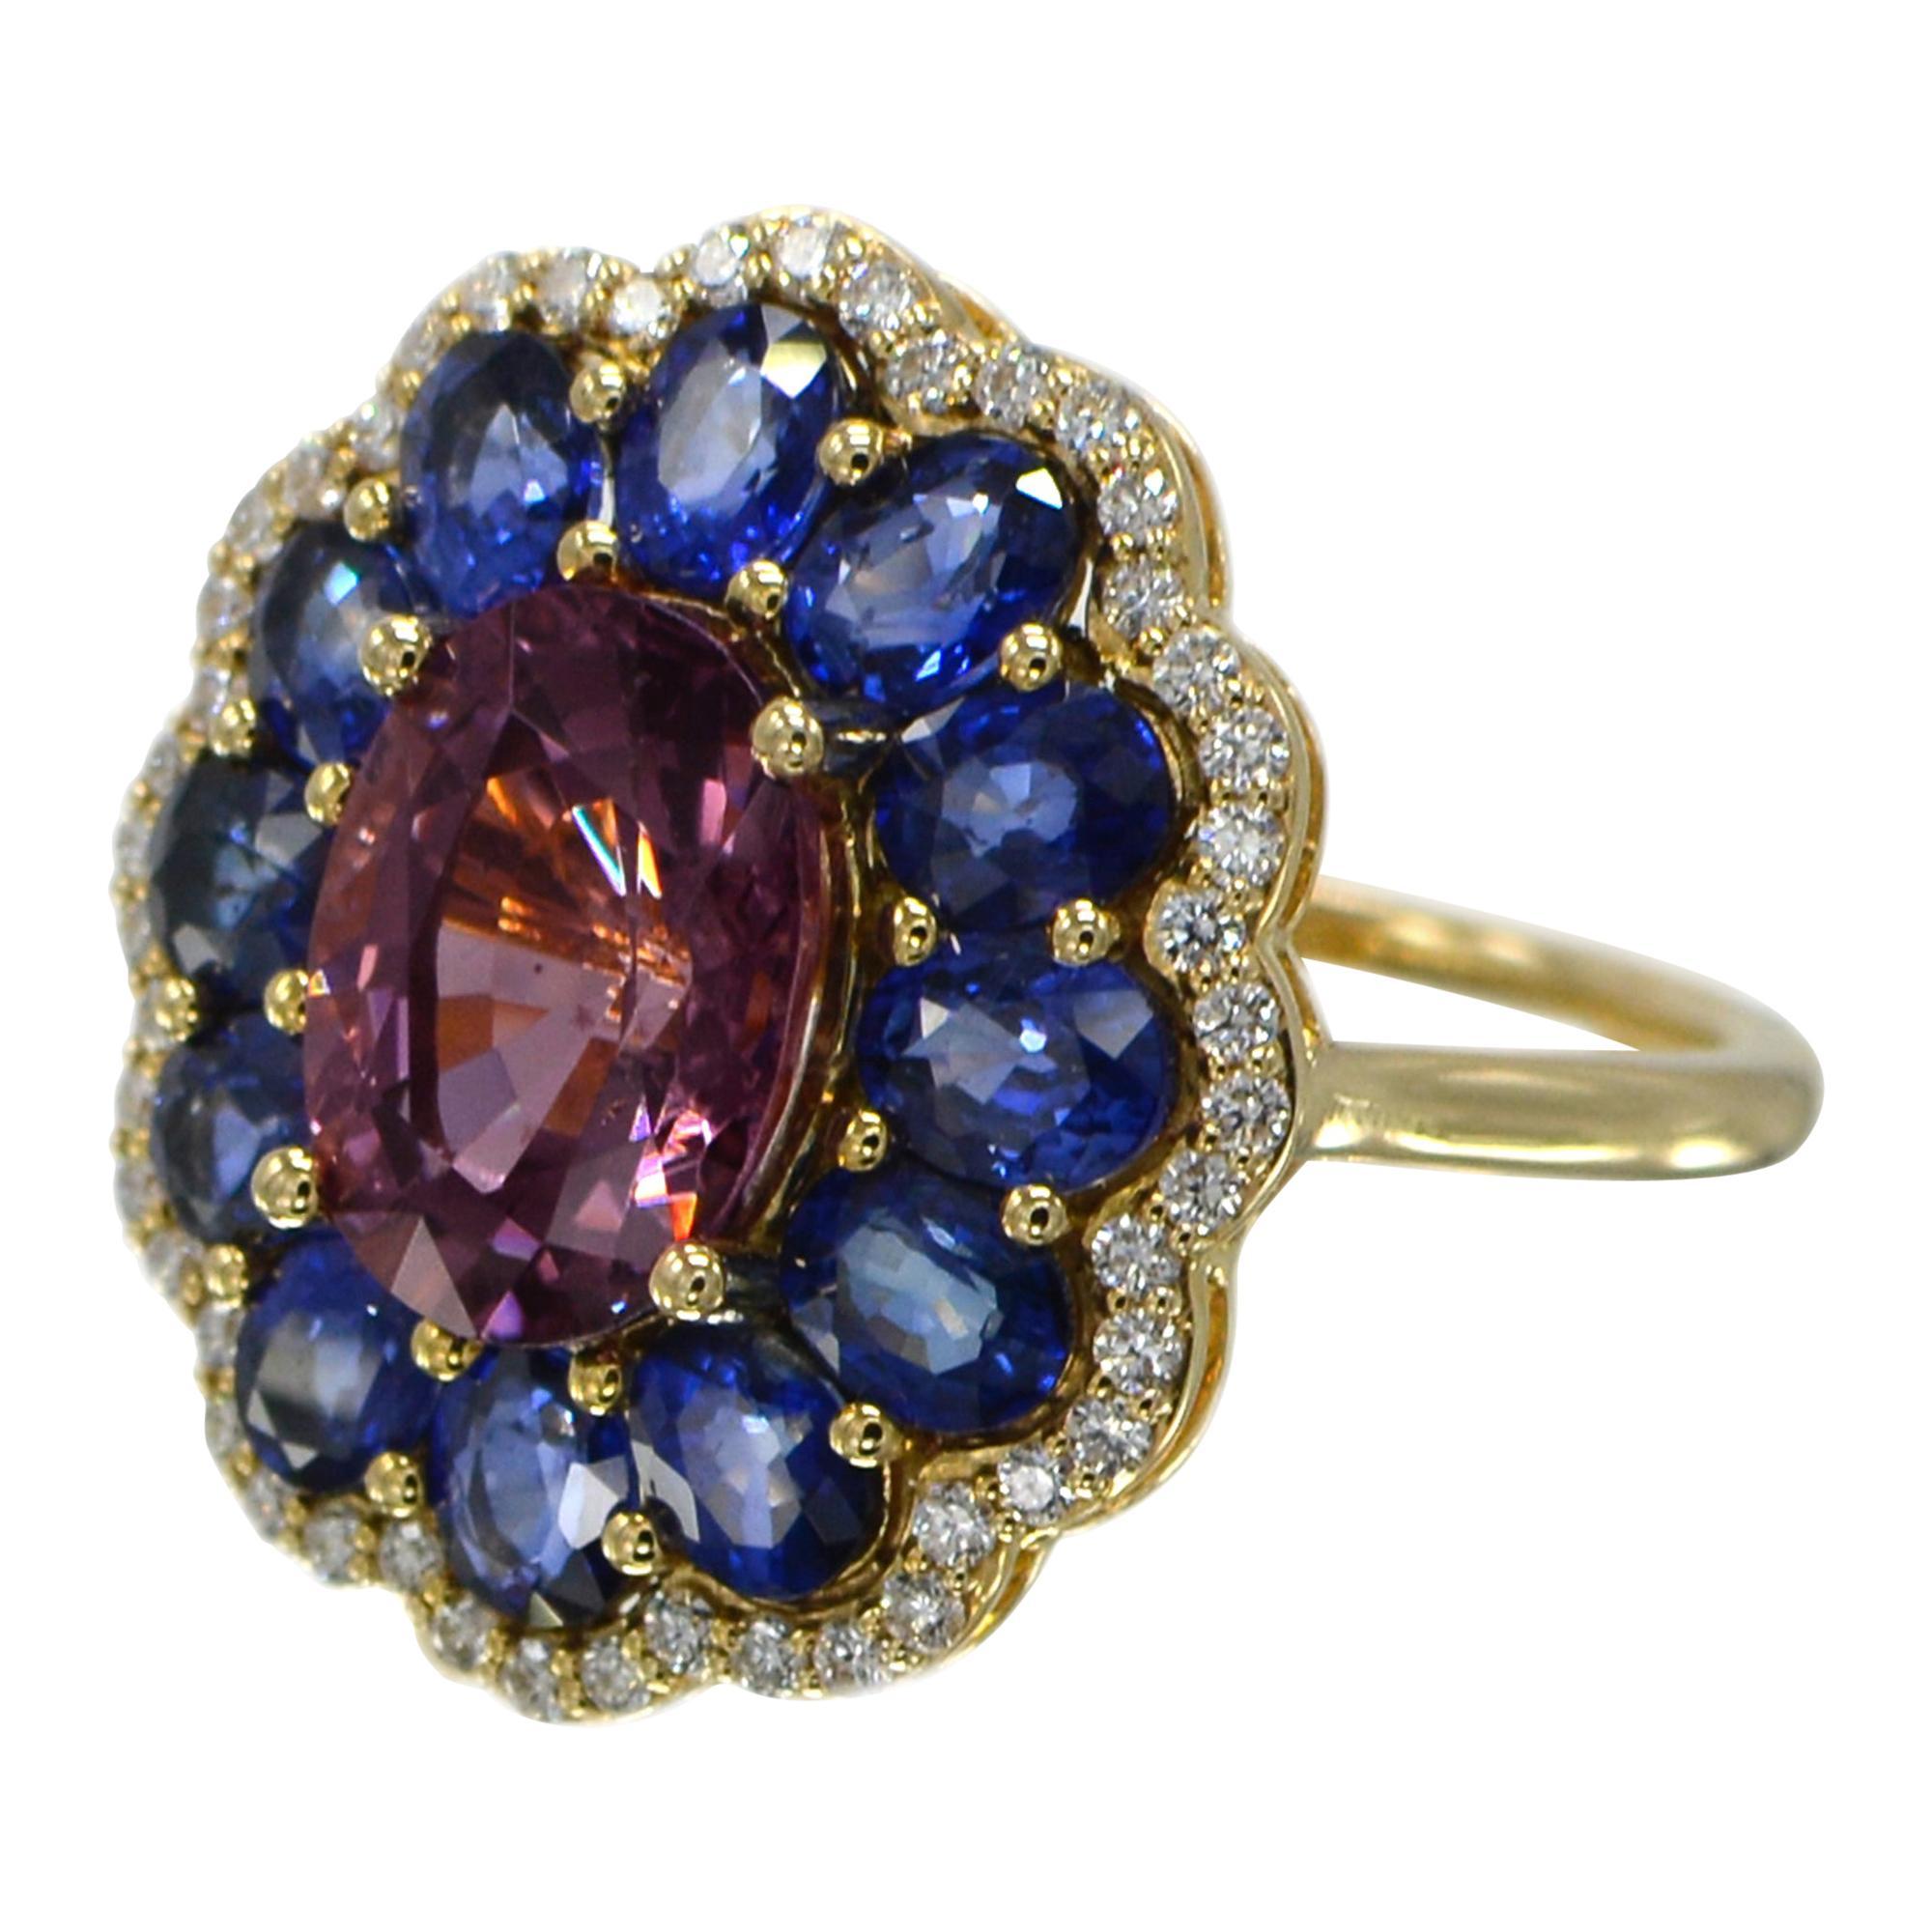 Blue Sapphire and Spinel Ring 14 Karat Rose Gold Oval Shape Spinel 3.0 Carat